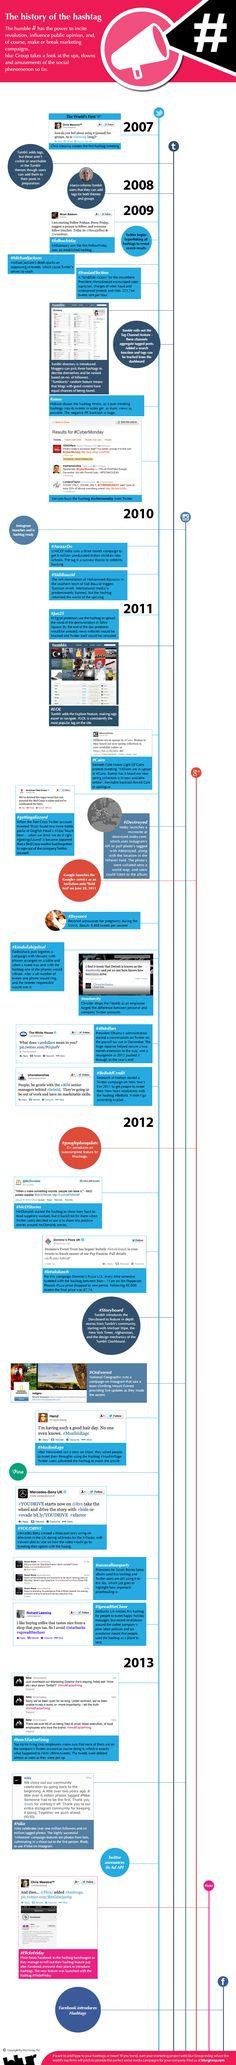 Timeline de los Hashtags #infografia #infographic #socialmedia